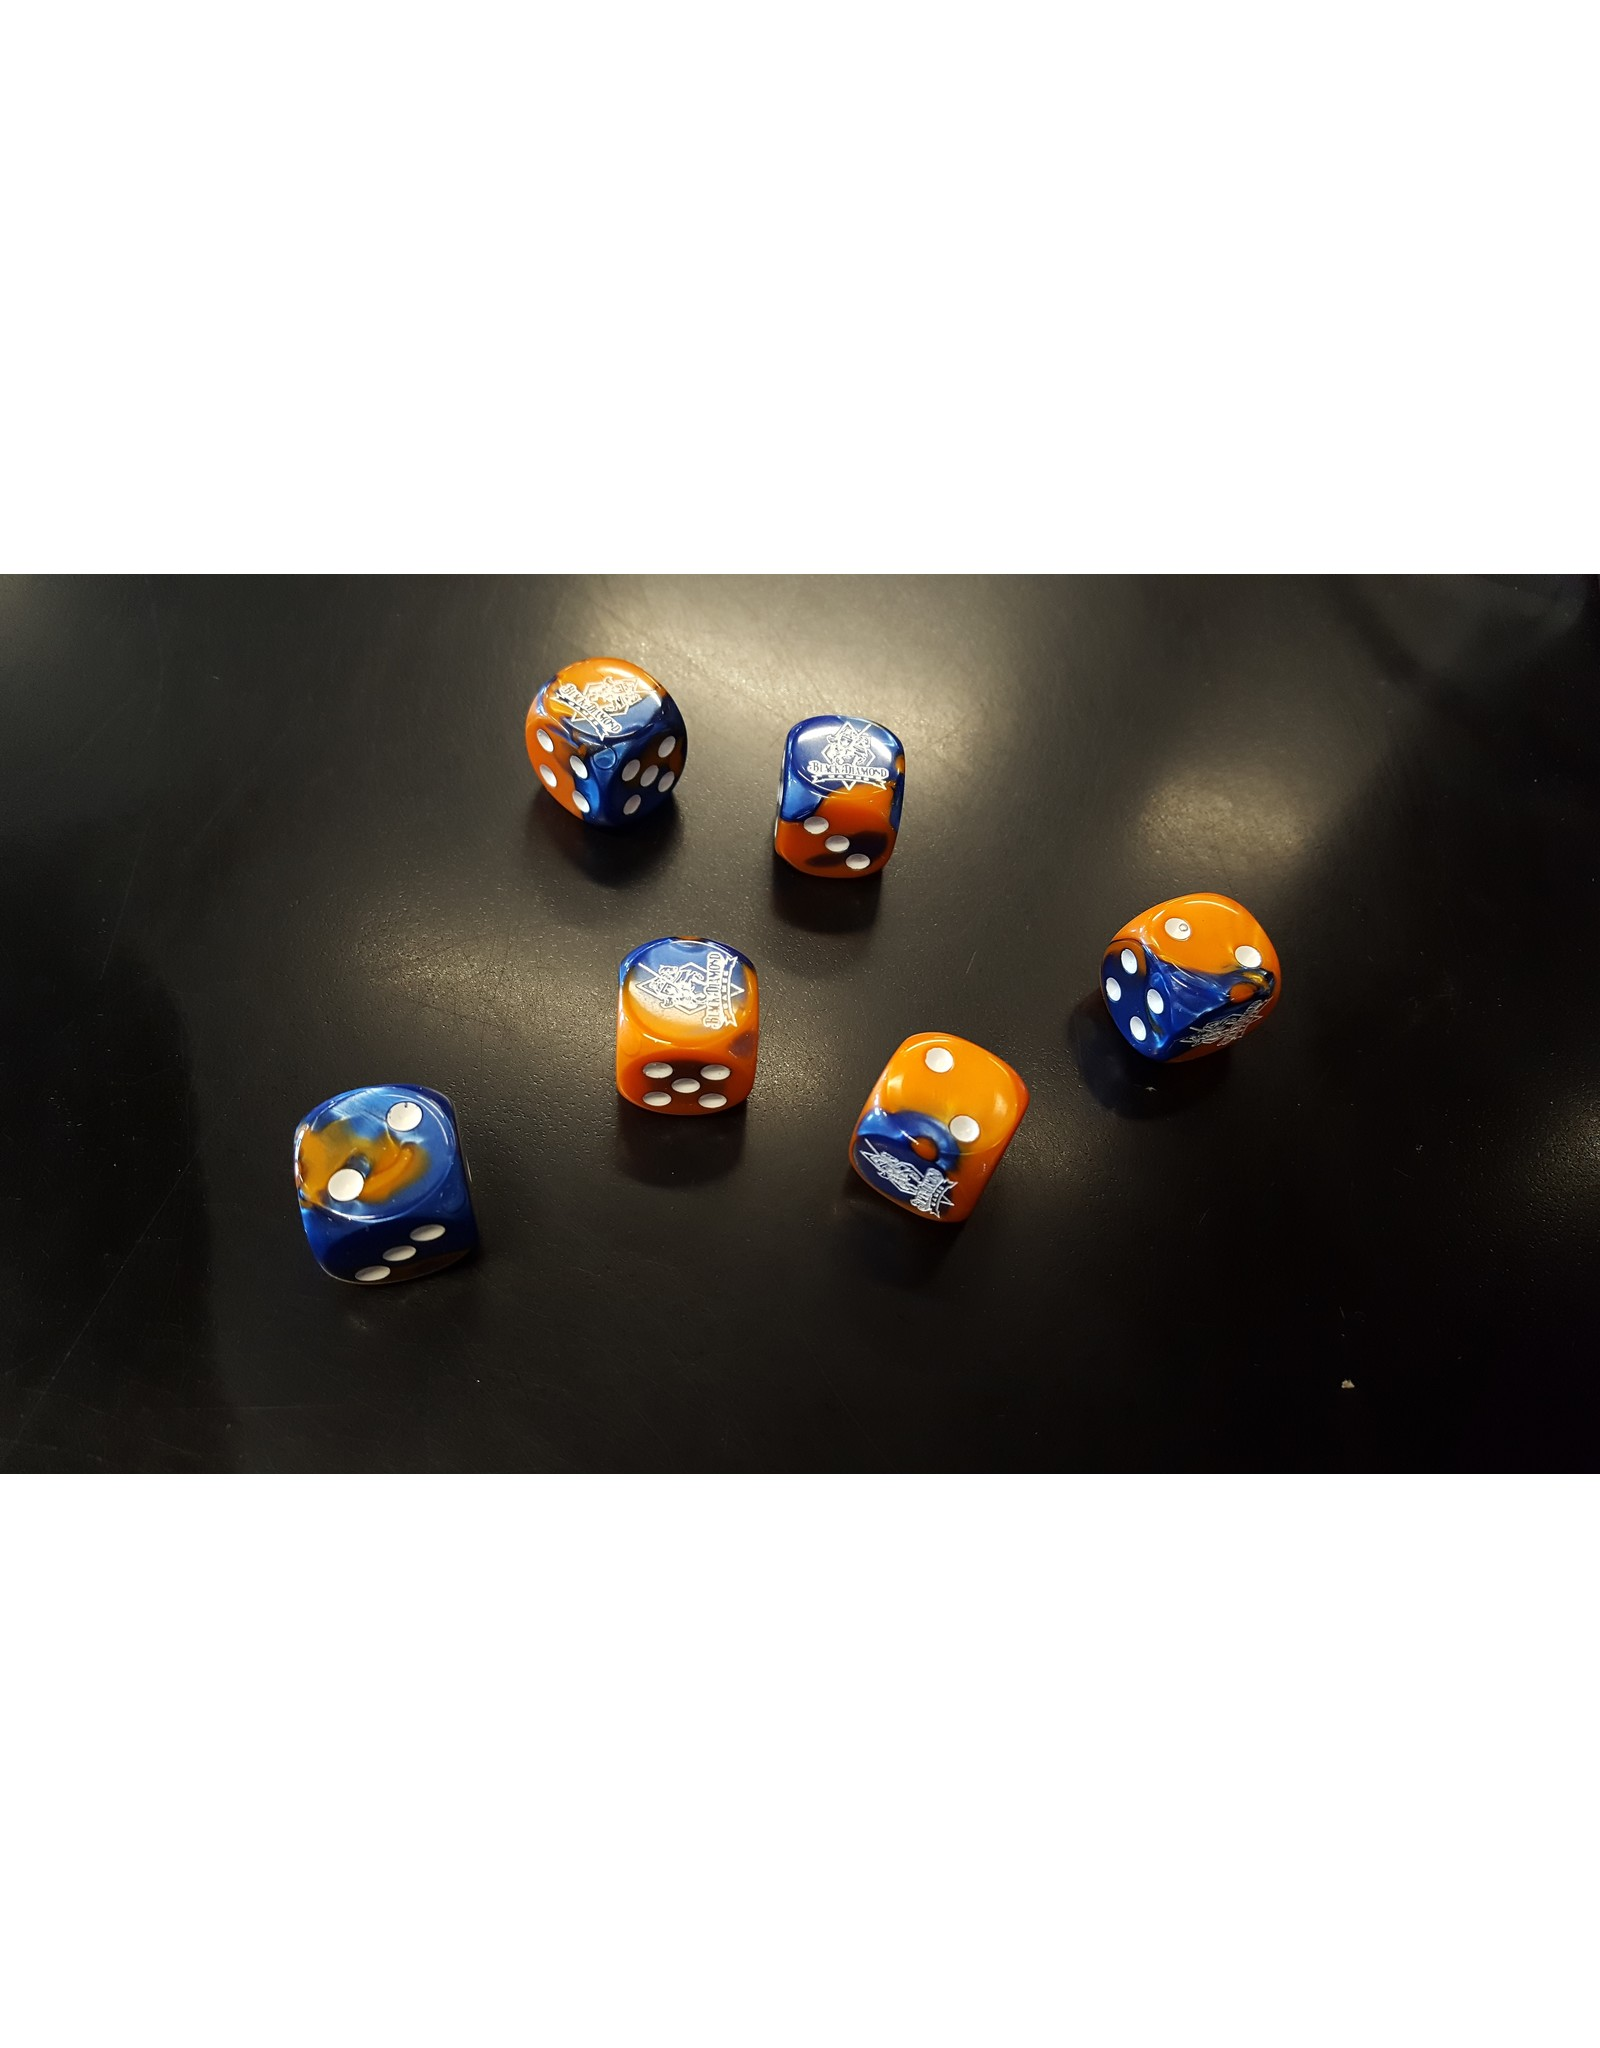 Dice Black Diamond Games Dice D6